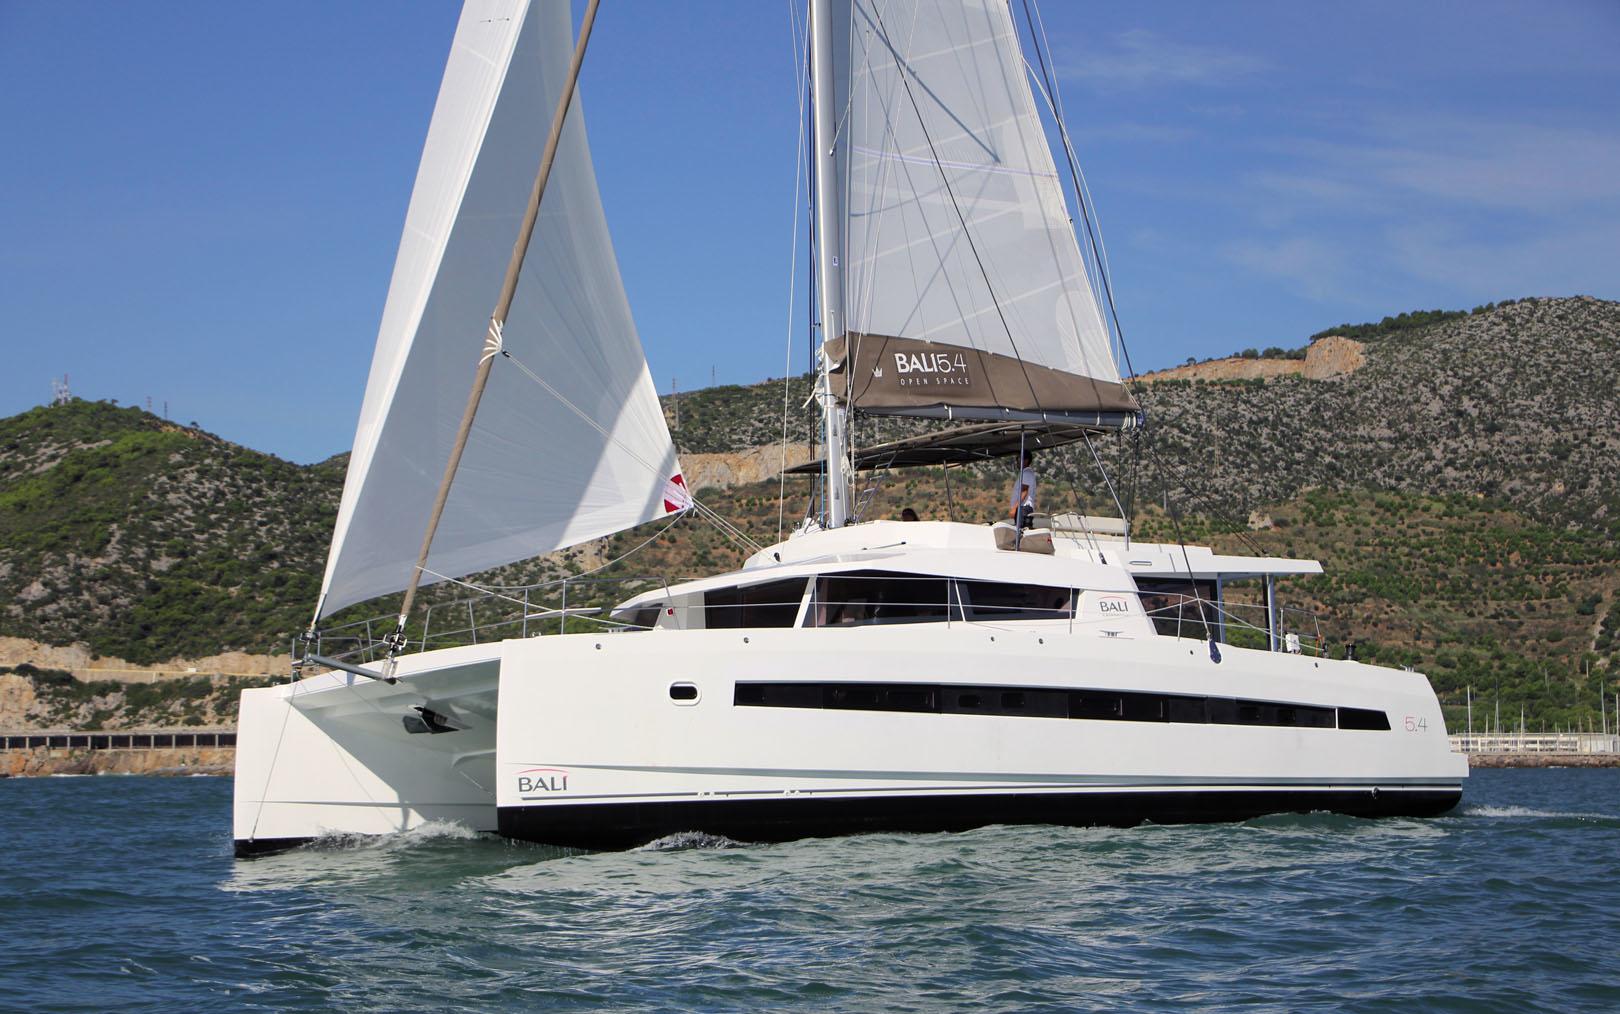 bali-5-4-catamaran-1